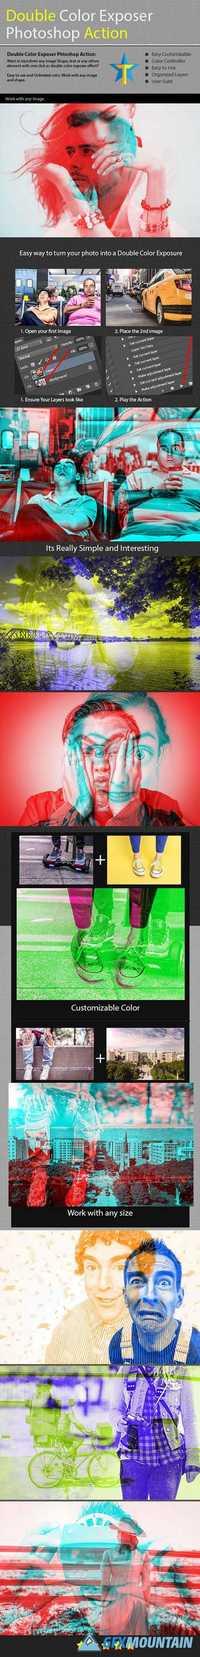 Graphicriver - Double Color Exposure Photoshop Action 19413574